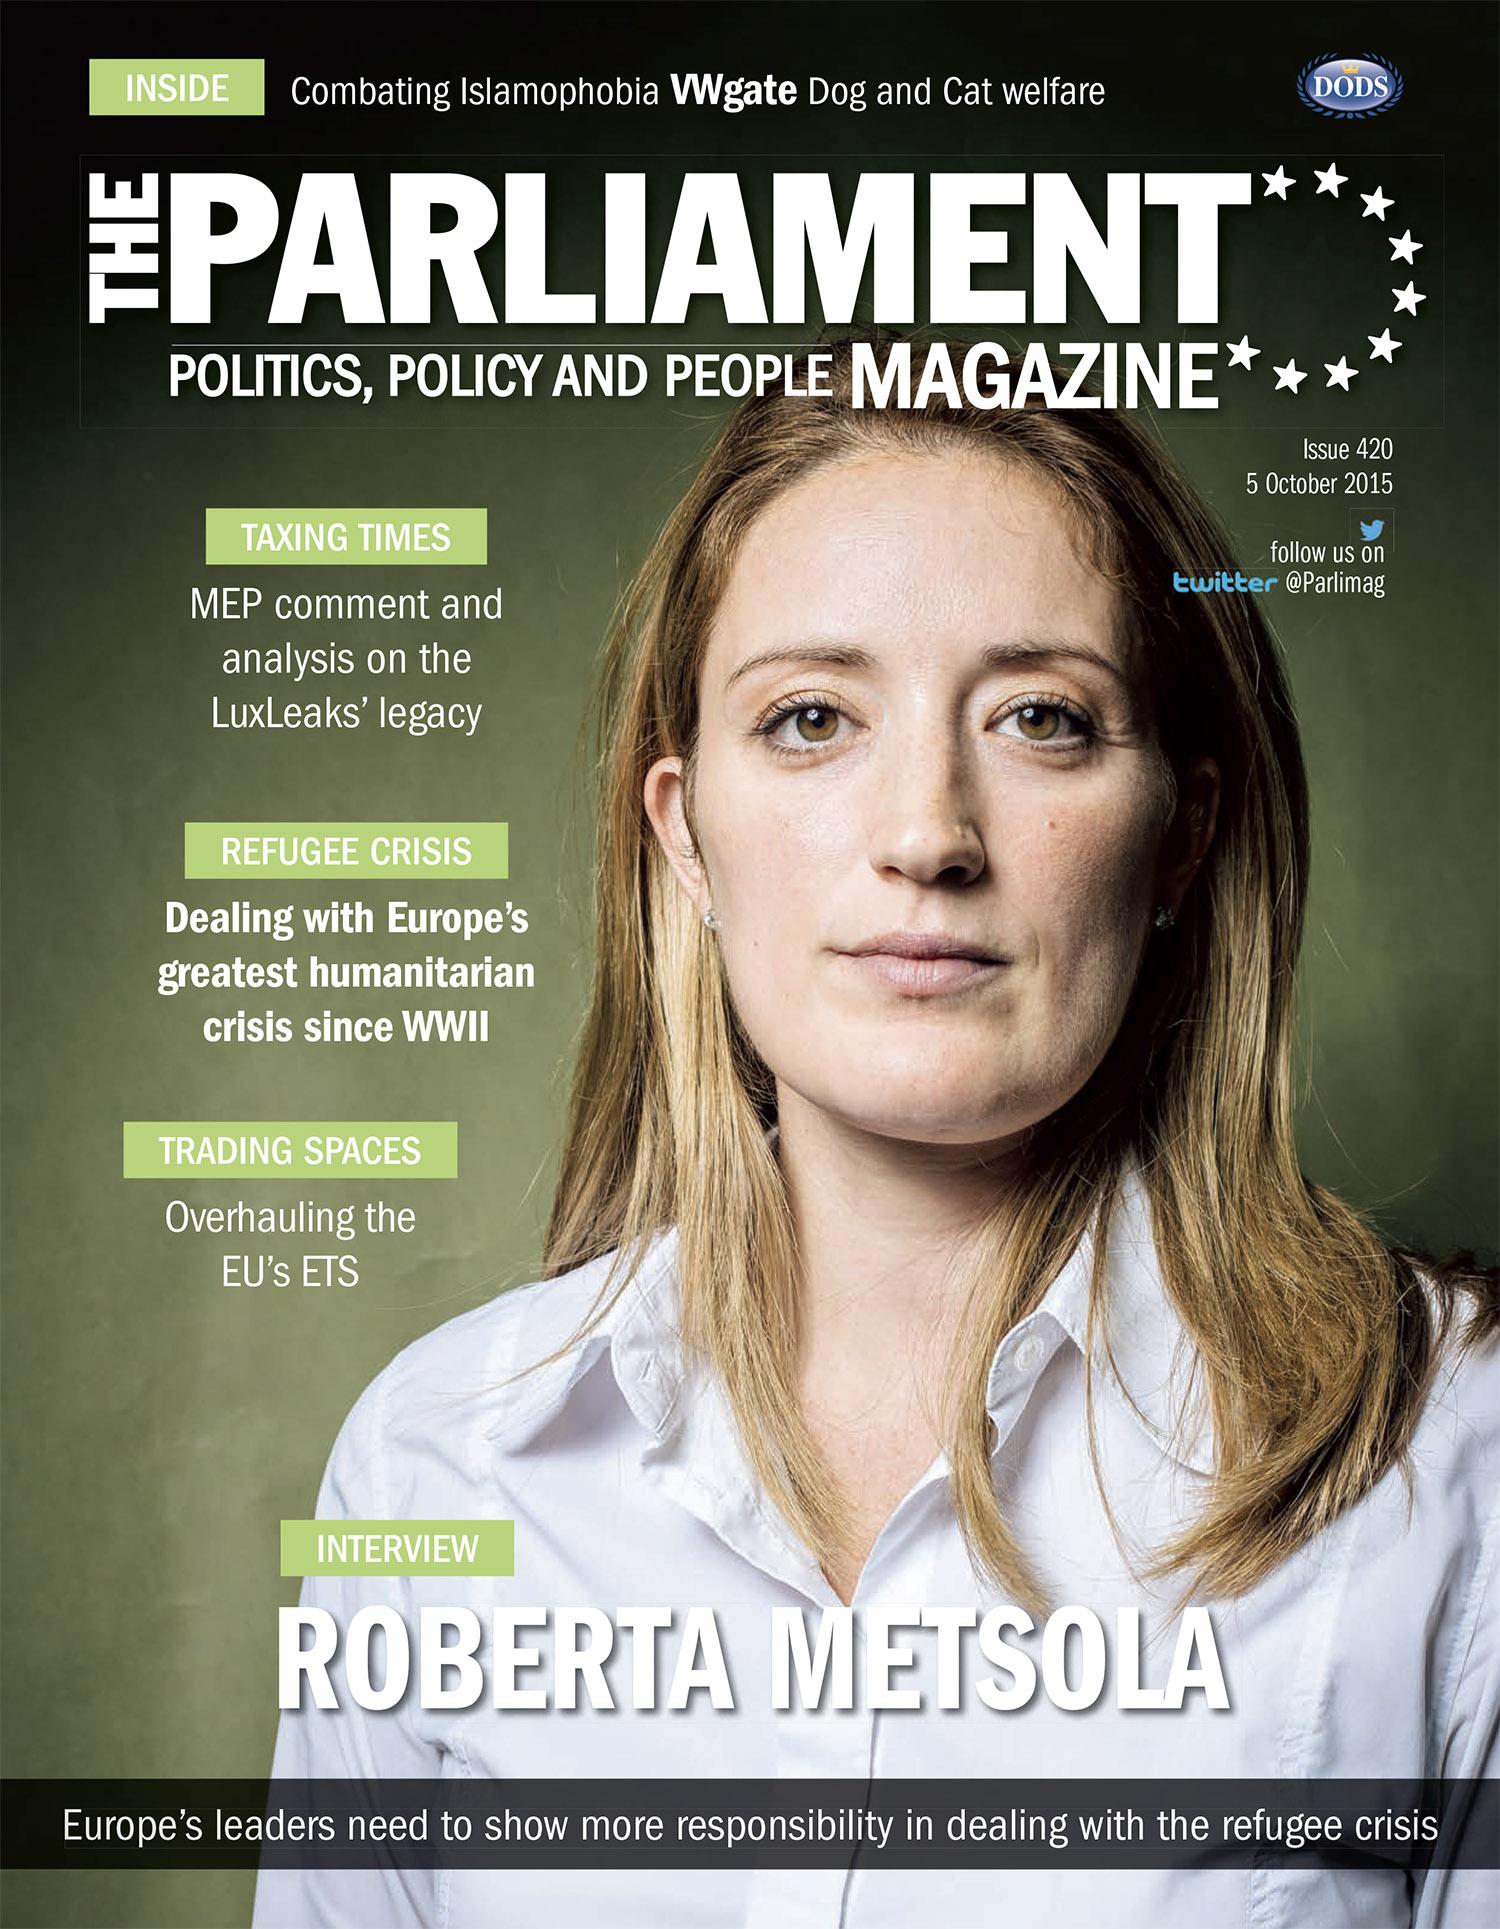 Roberta Metsola